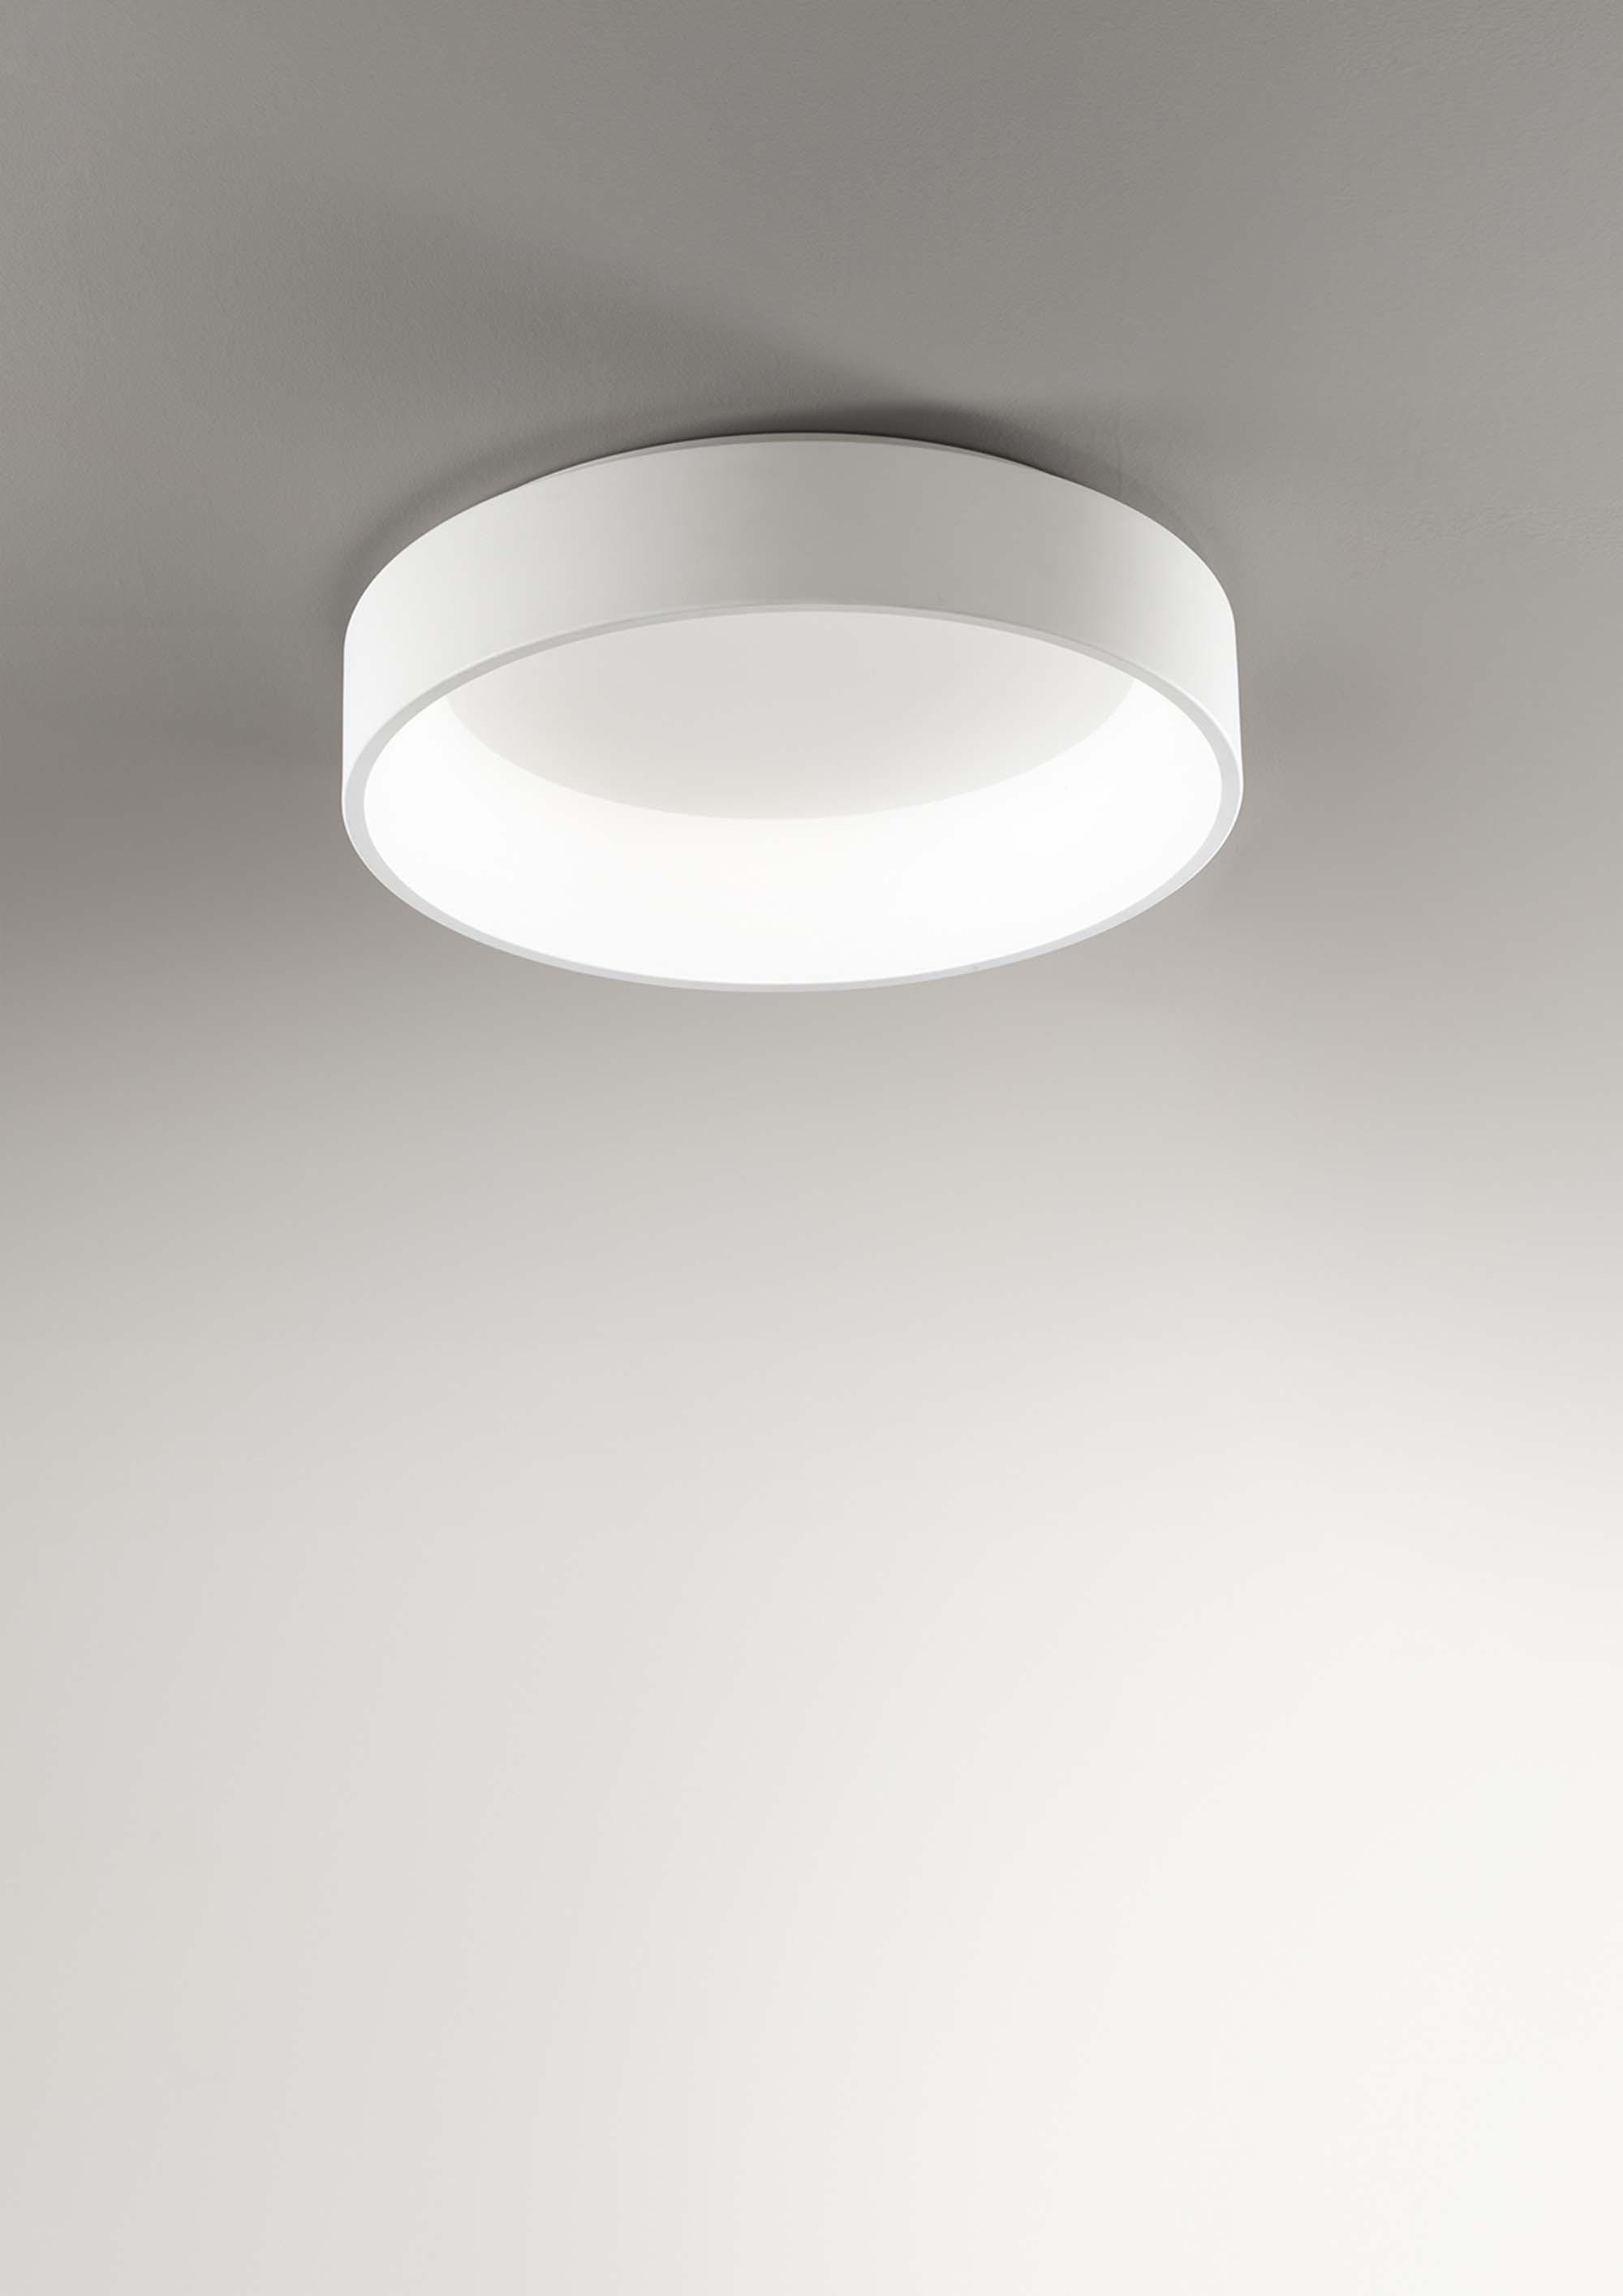 Modern led ceiling lamp 33w design affra 2072 Band diodi